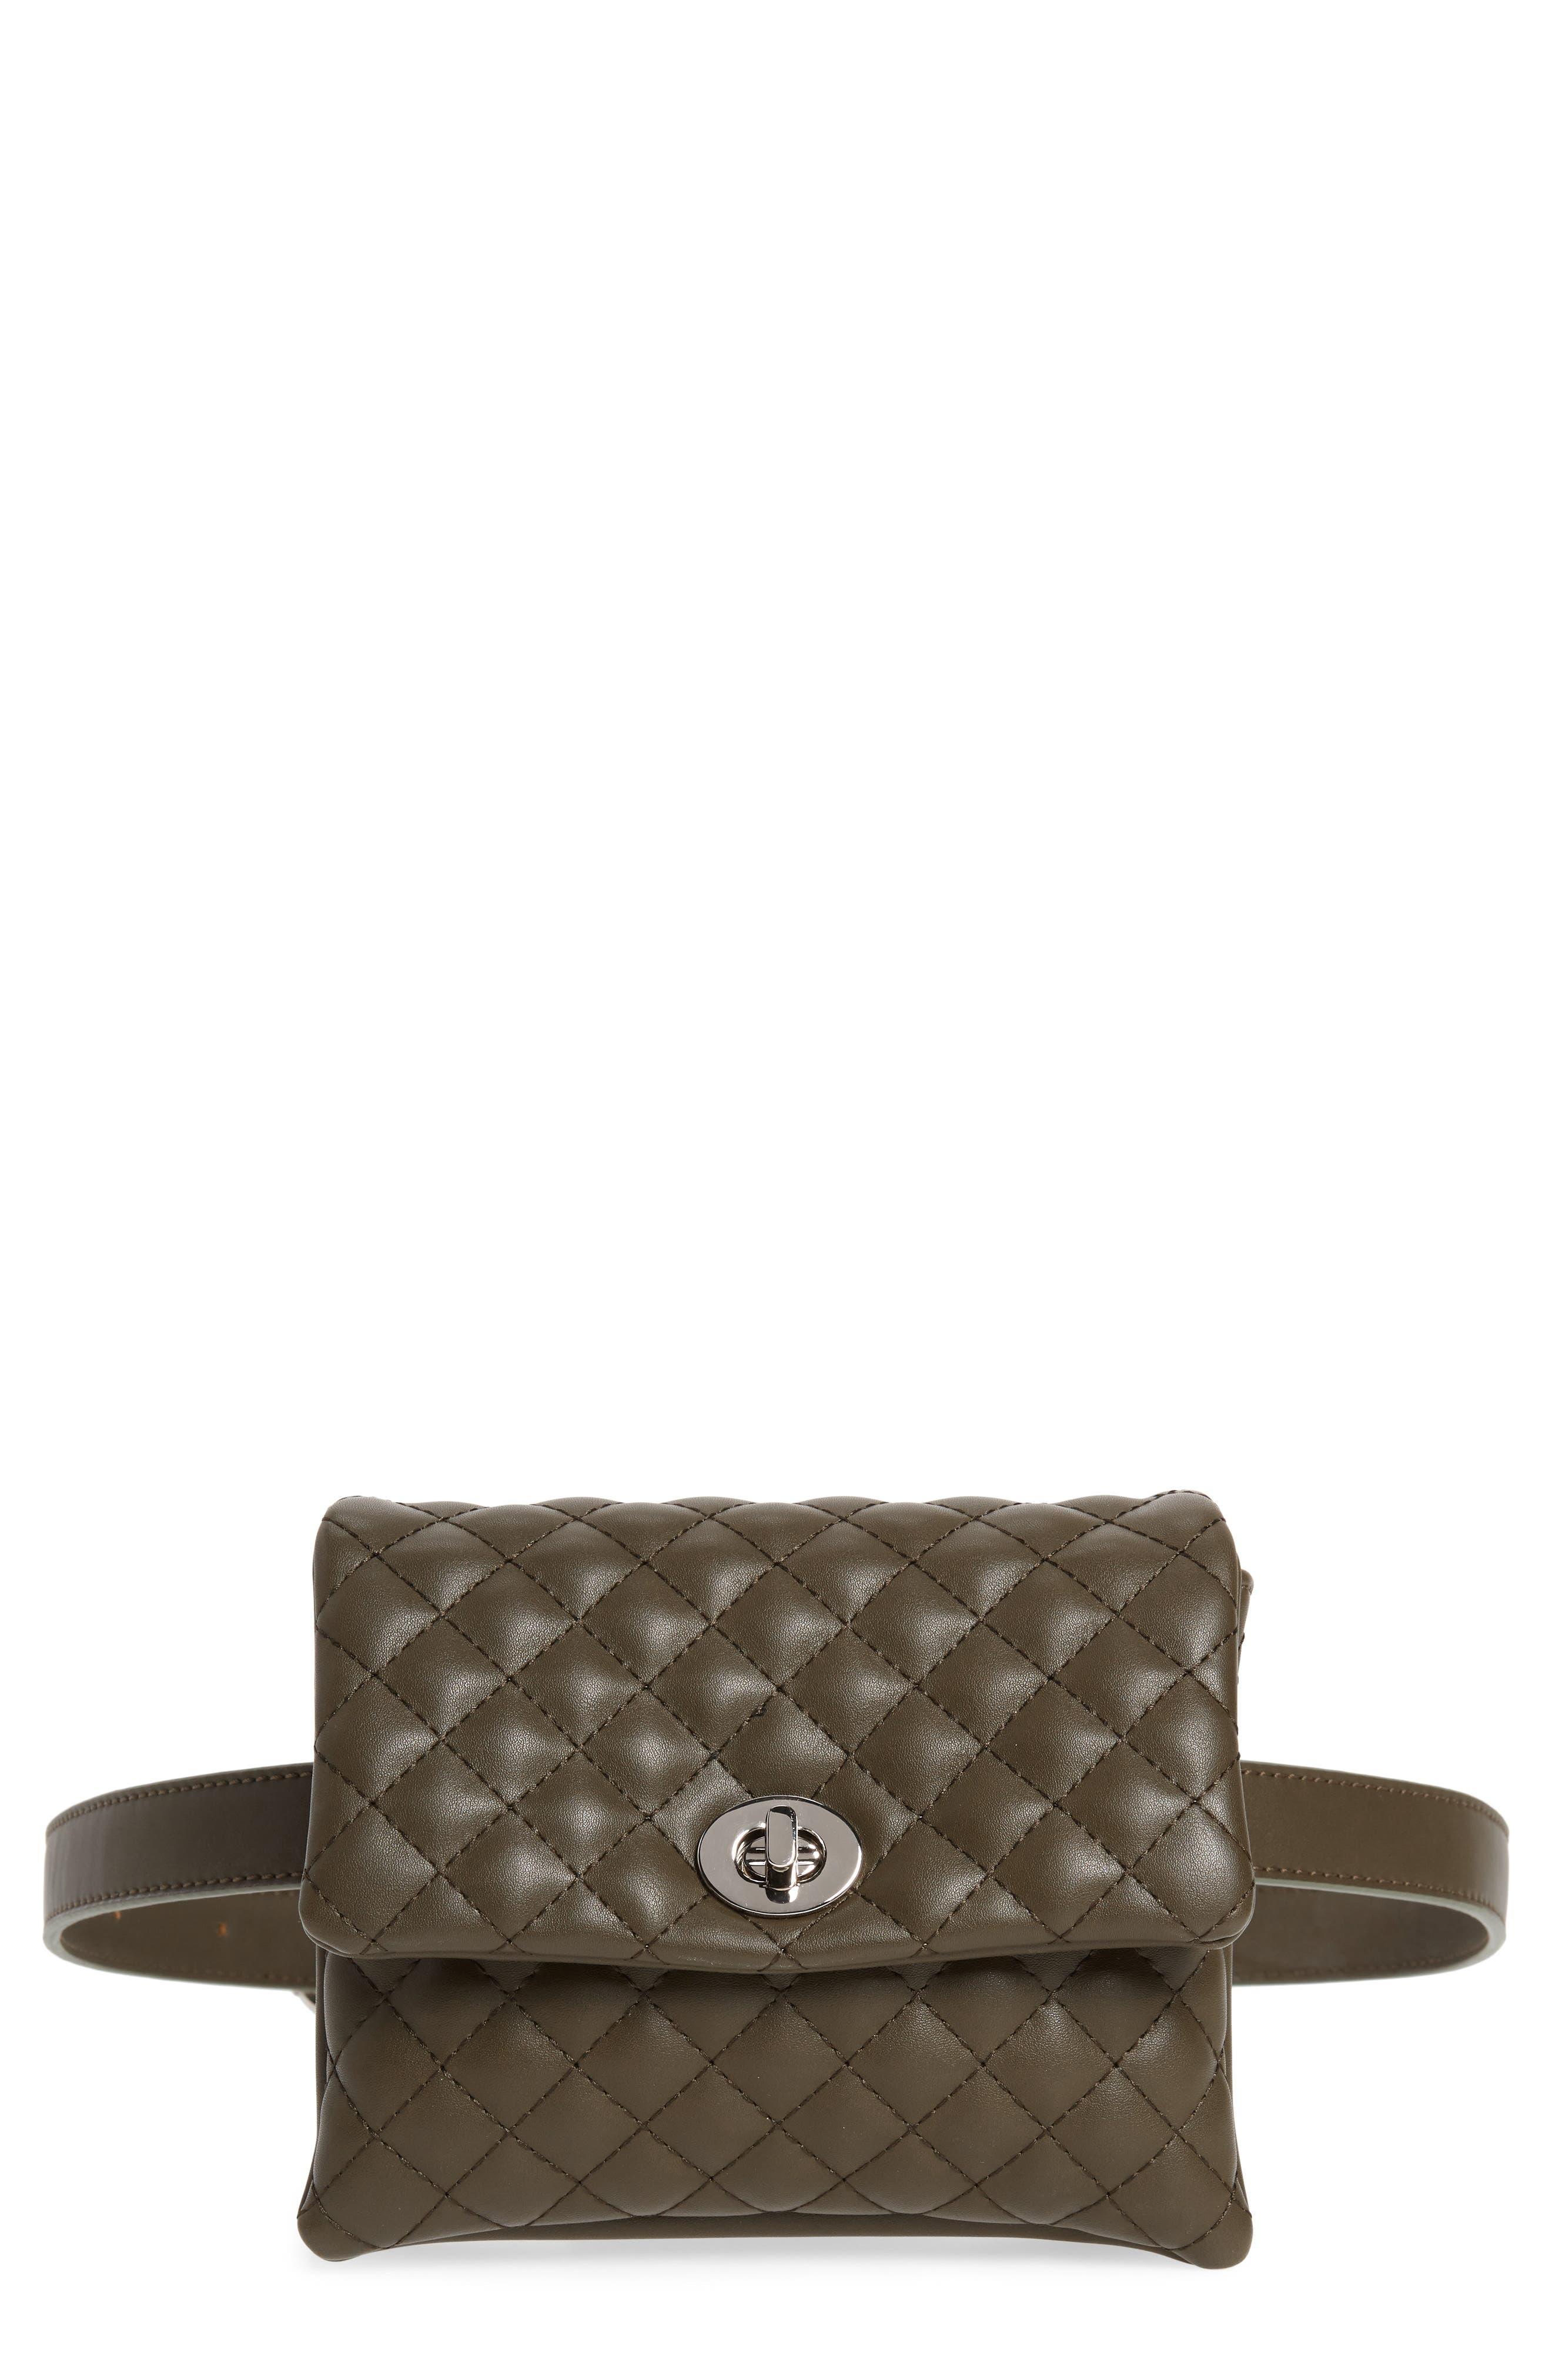 Mali + Lili Quilted Vegan Leather Convertible Belt Bag,                         Main,                         color, OLIVE